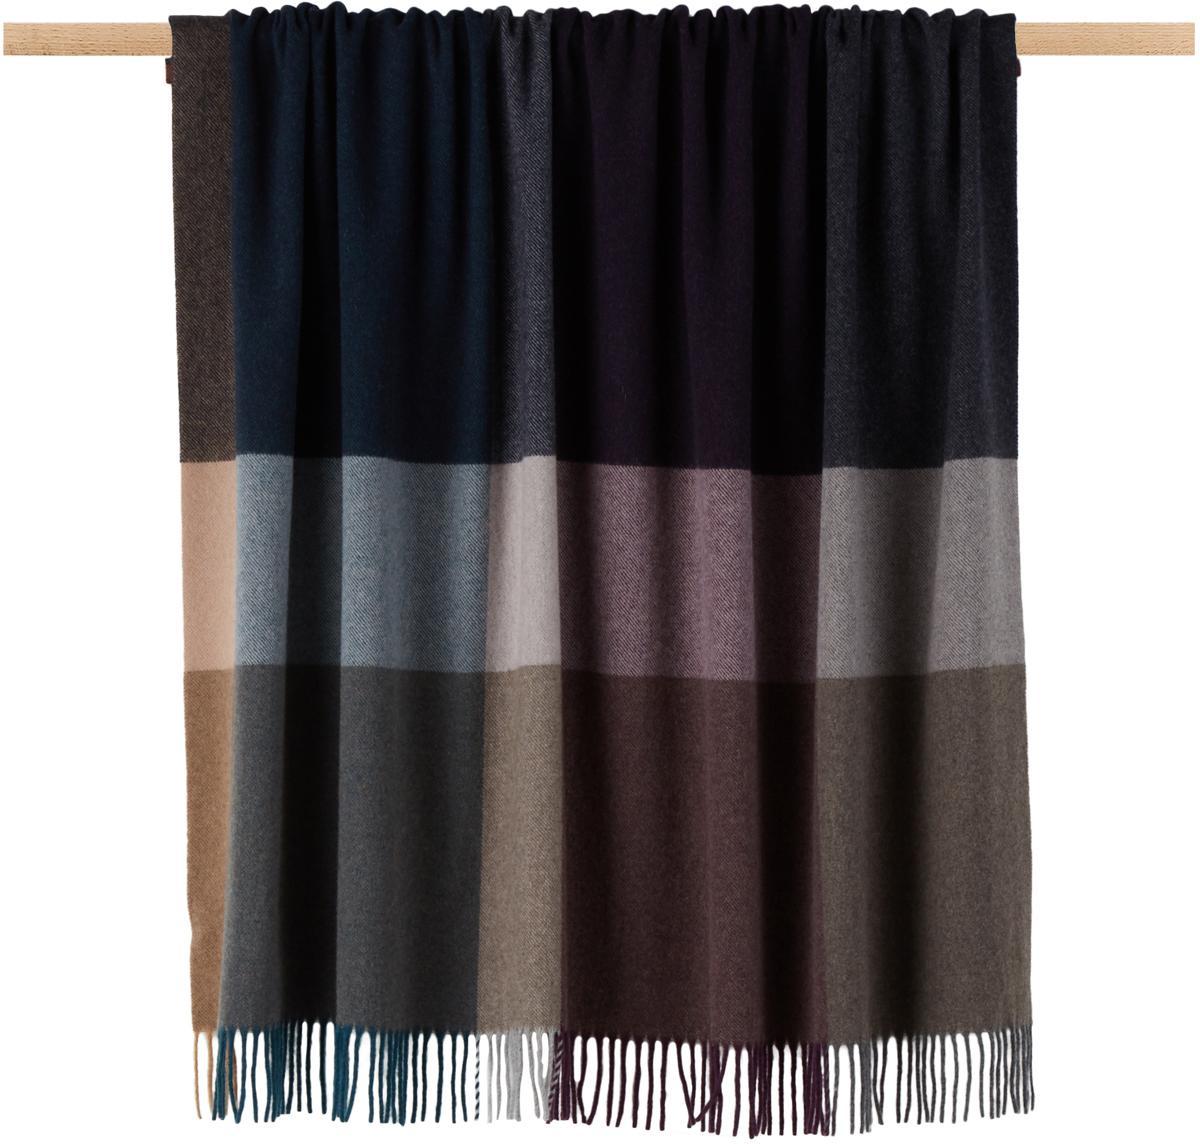 Kaschmir-Plaid Variation Purple, 80% Wolle, 20% Kaschmir, Mehrfarbig, 130 x 170 cm